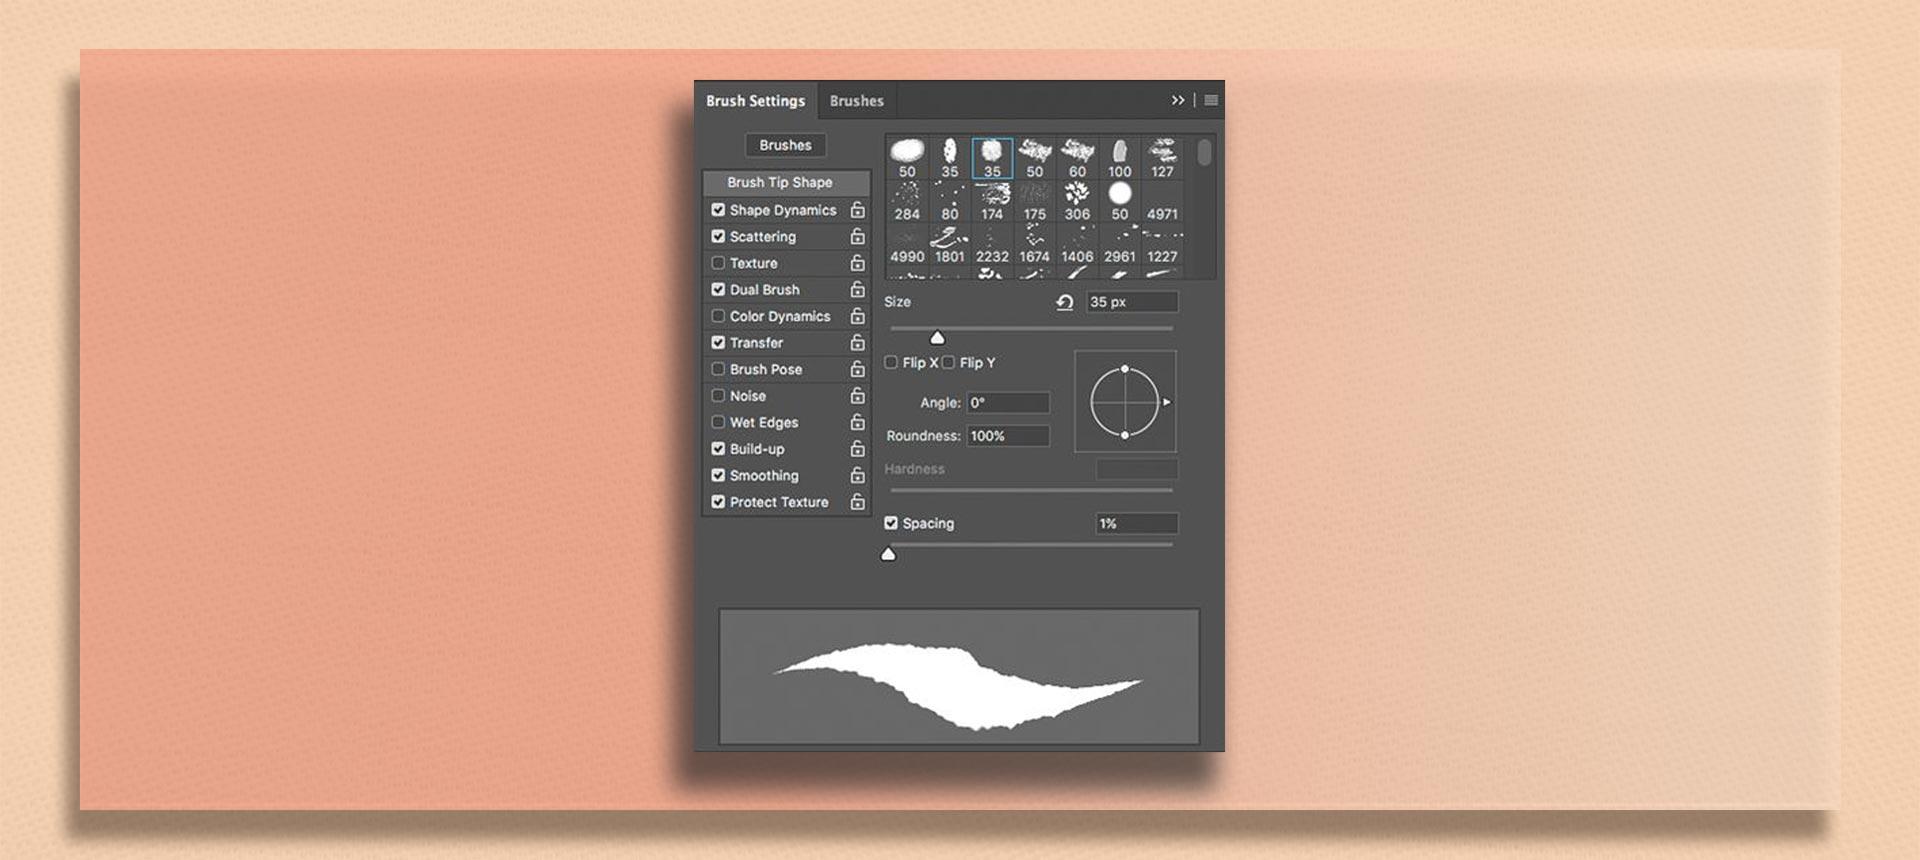 brush tool  photoshop9 - چگونه از ابزار براش در فتوشاپ استفاده کنیم